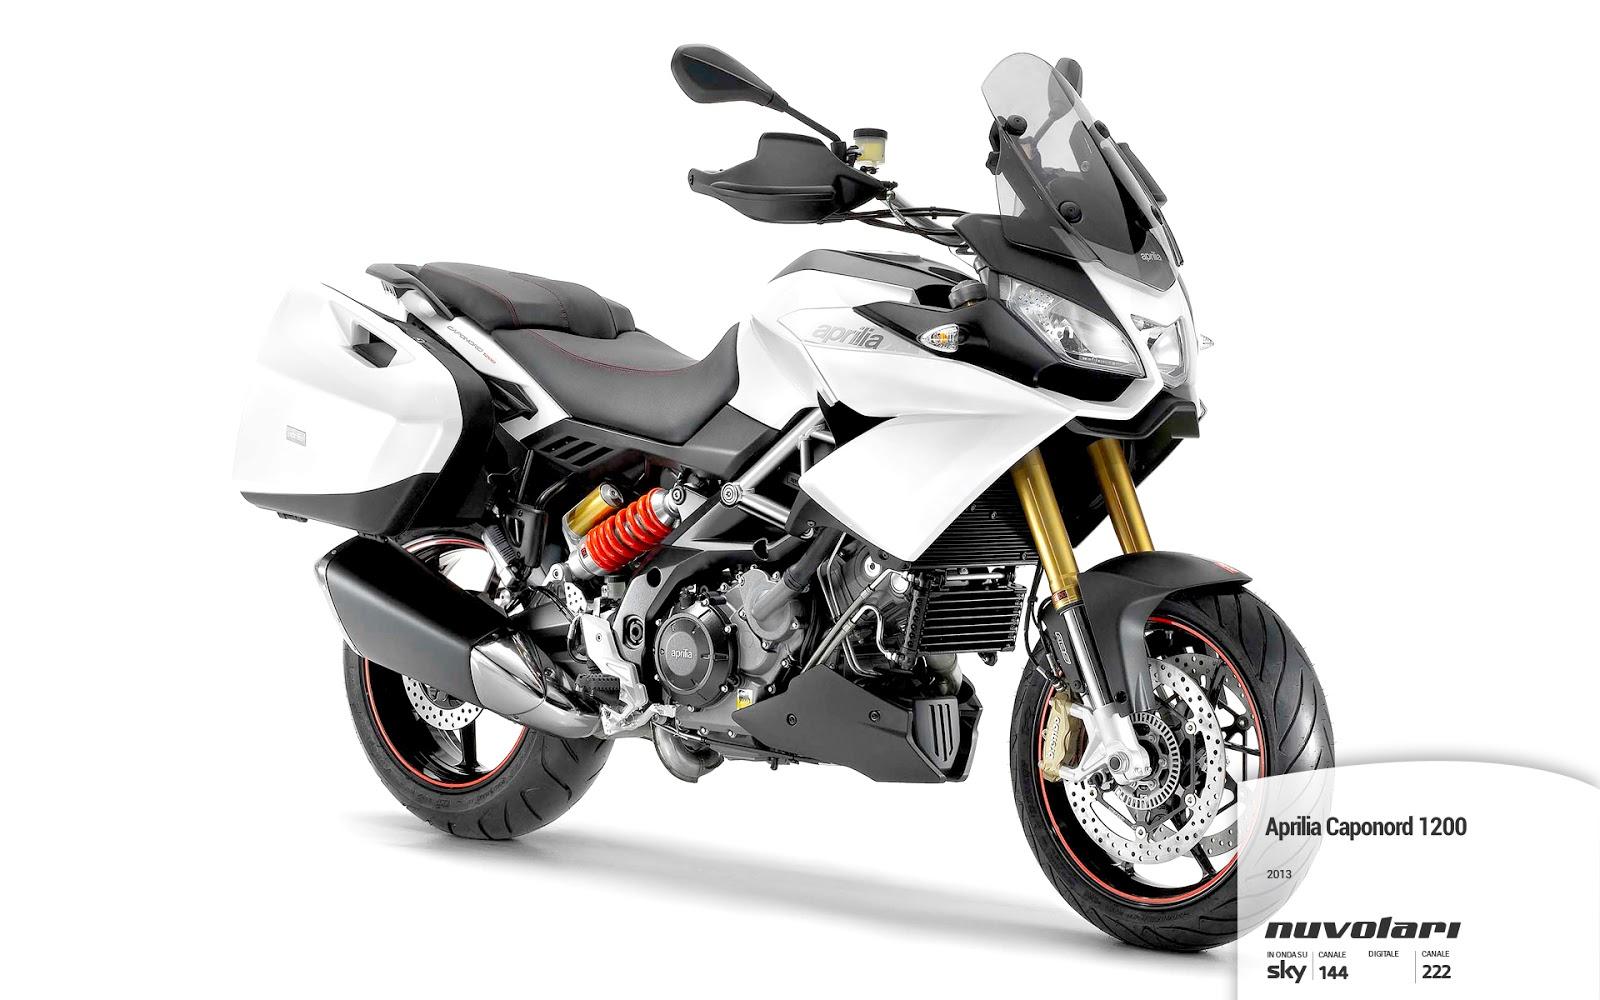 aprilia caponord 1200 2013 bike special. Black Bedroom Furniture Sets. Home Design Ideas